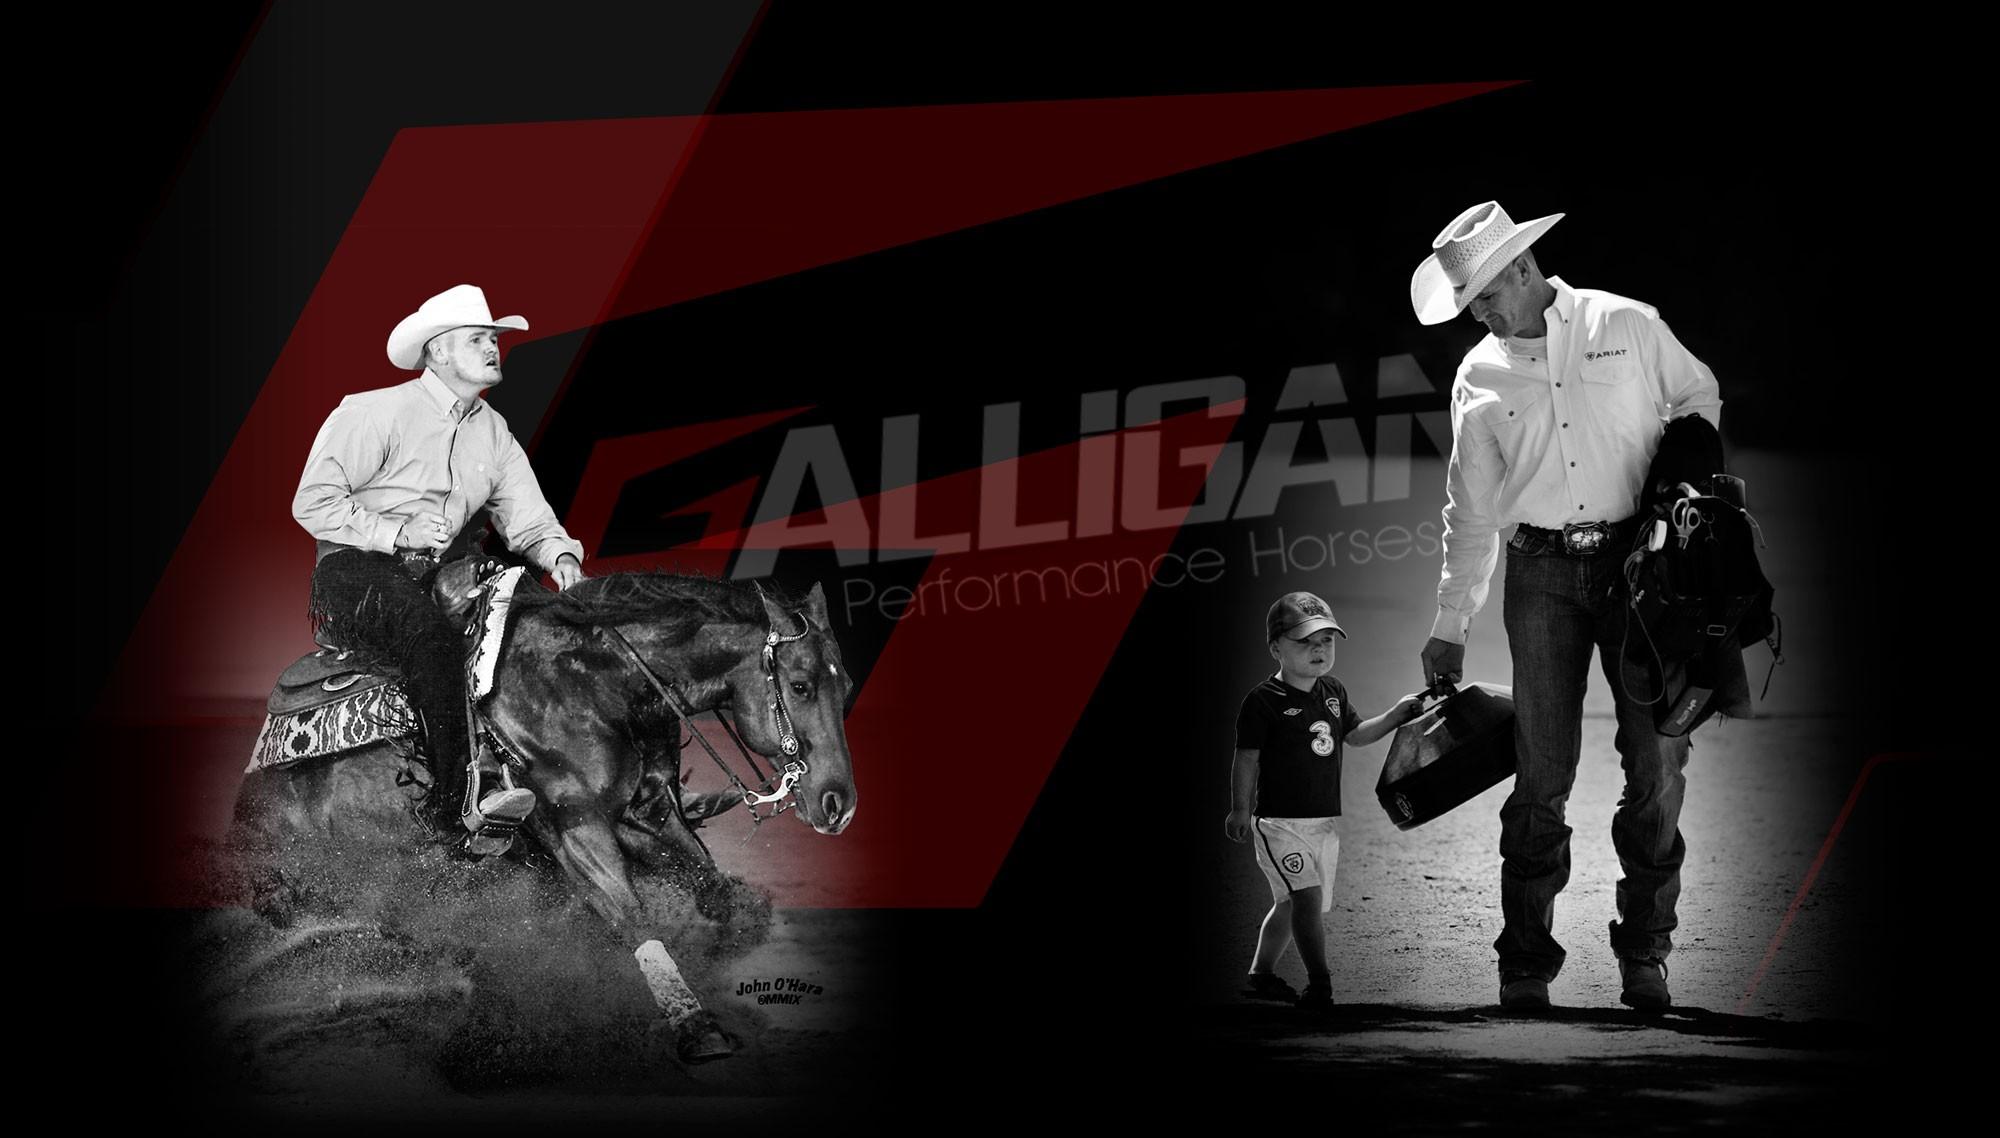 Galligan Performance Horses